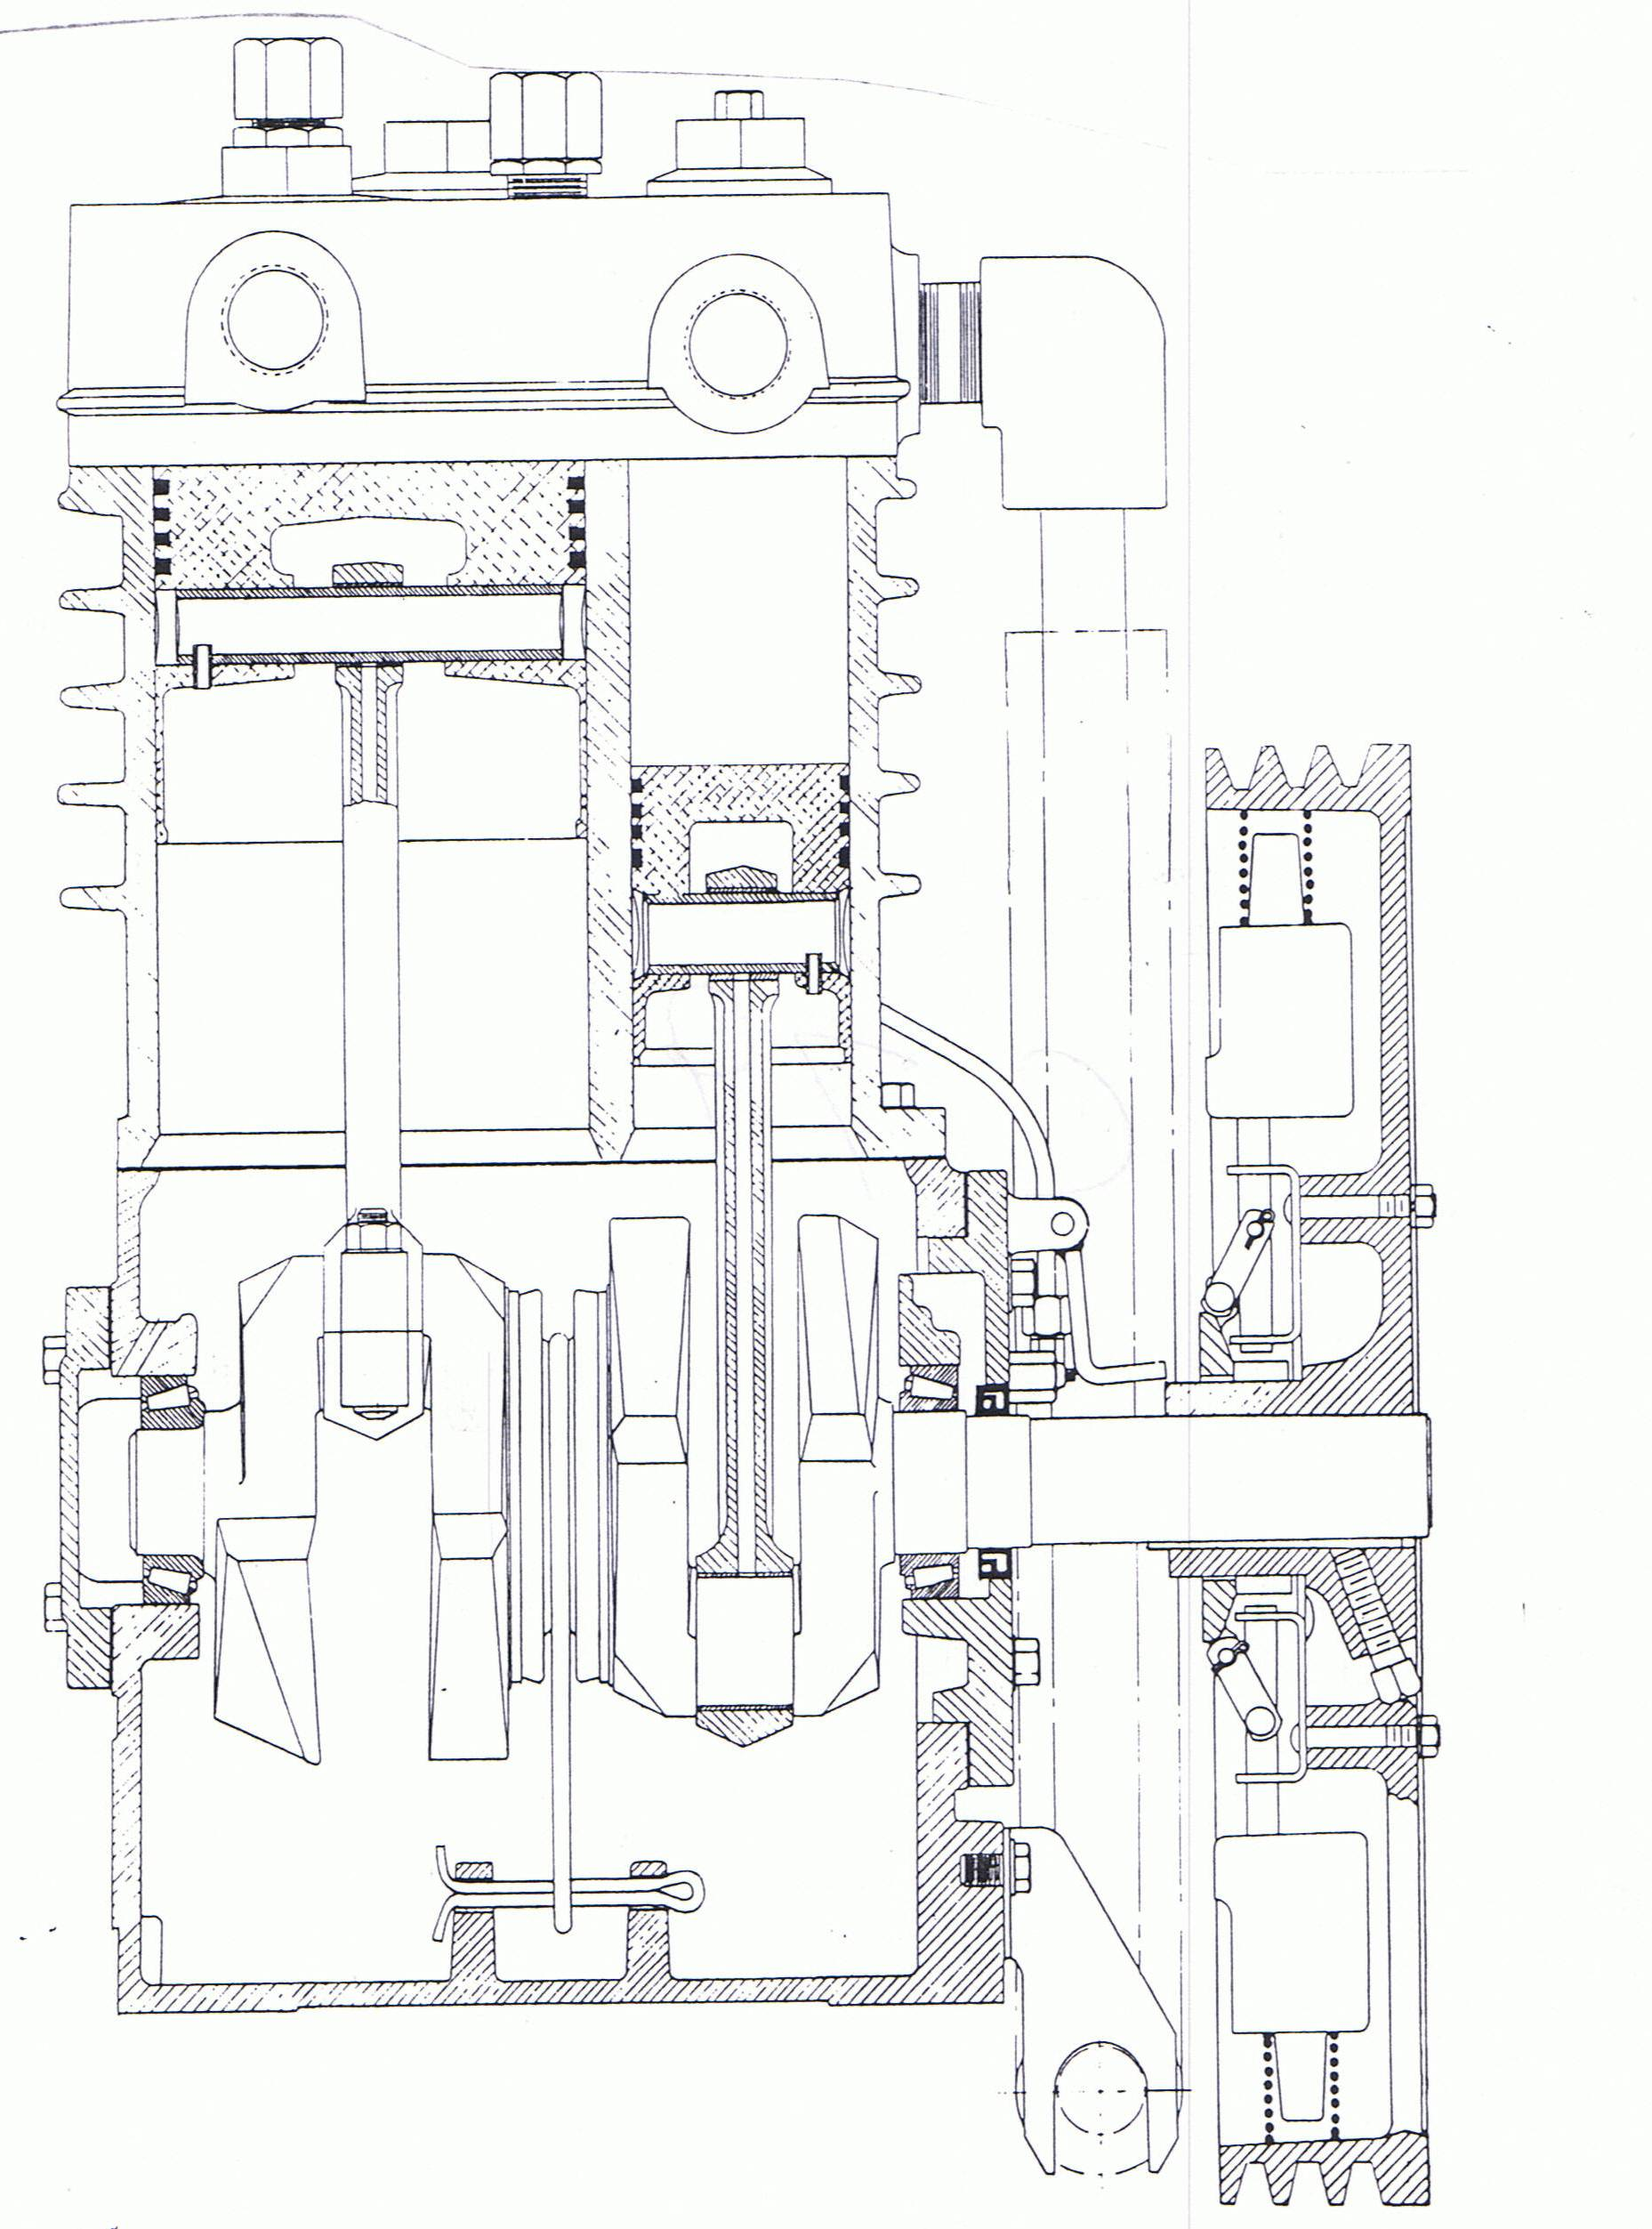 C79 Inventory Air Flo Inc